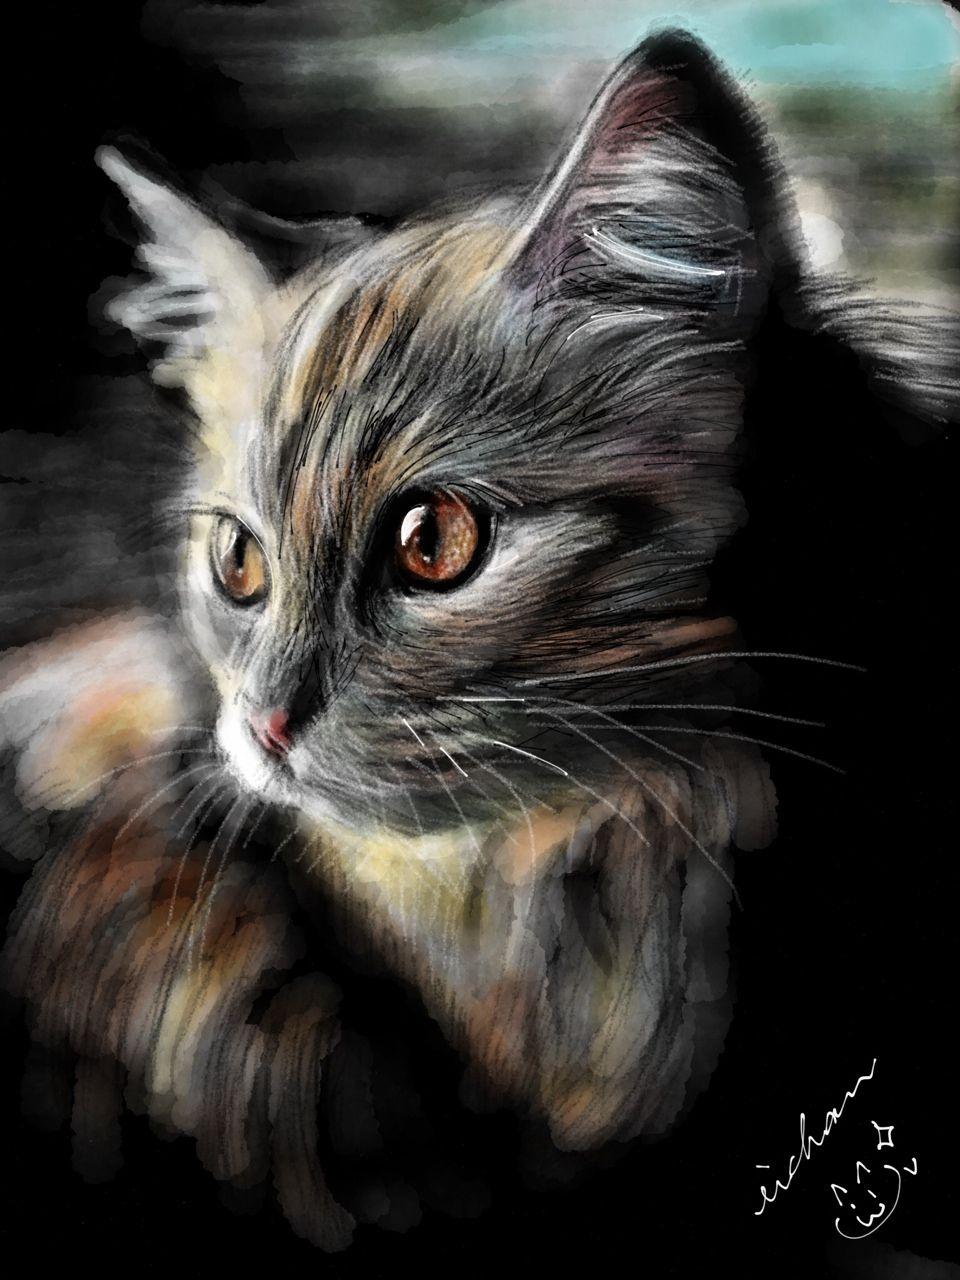 cats | Tumblr